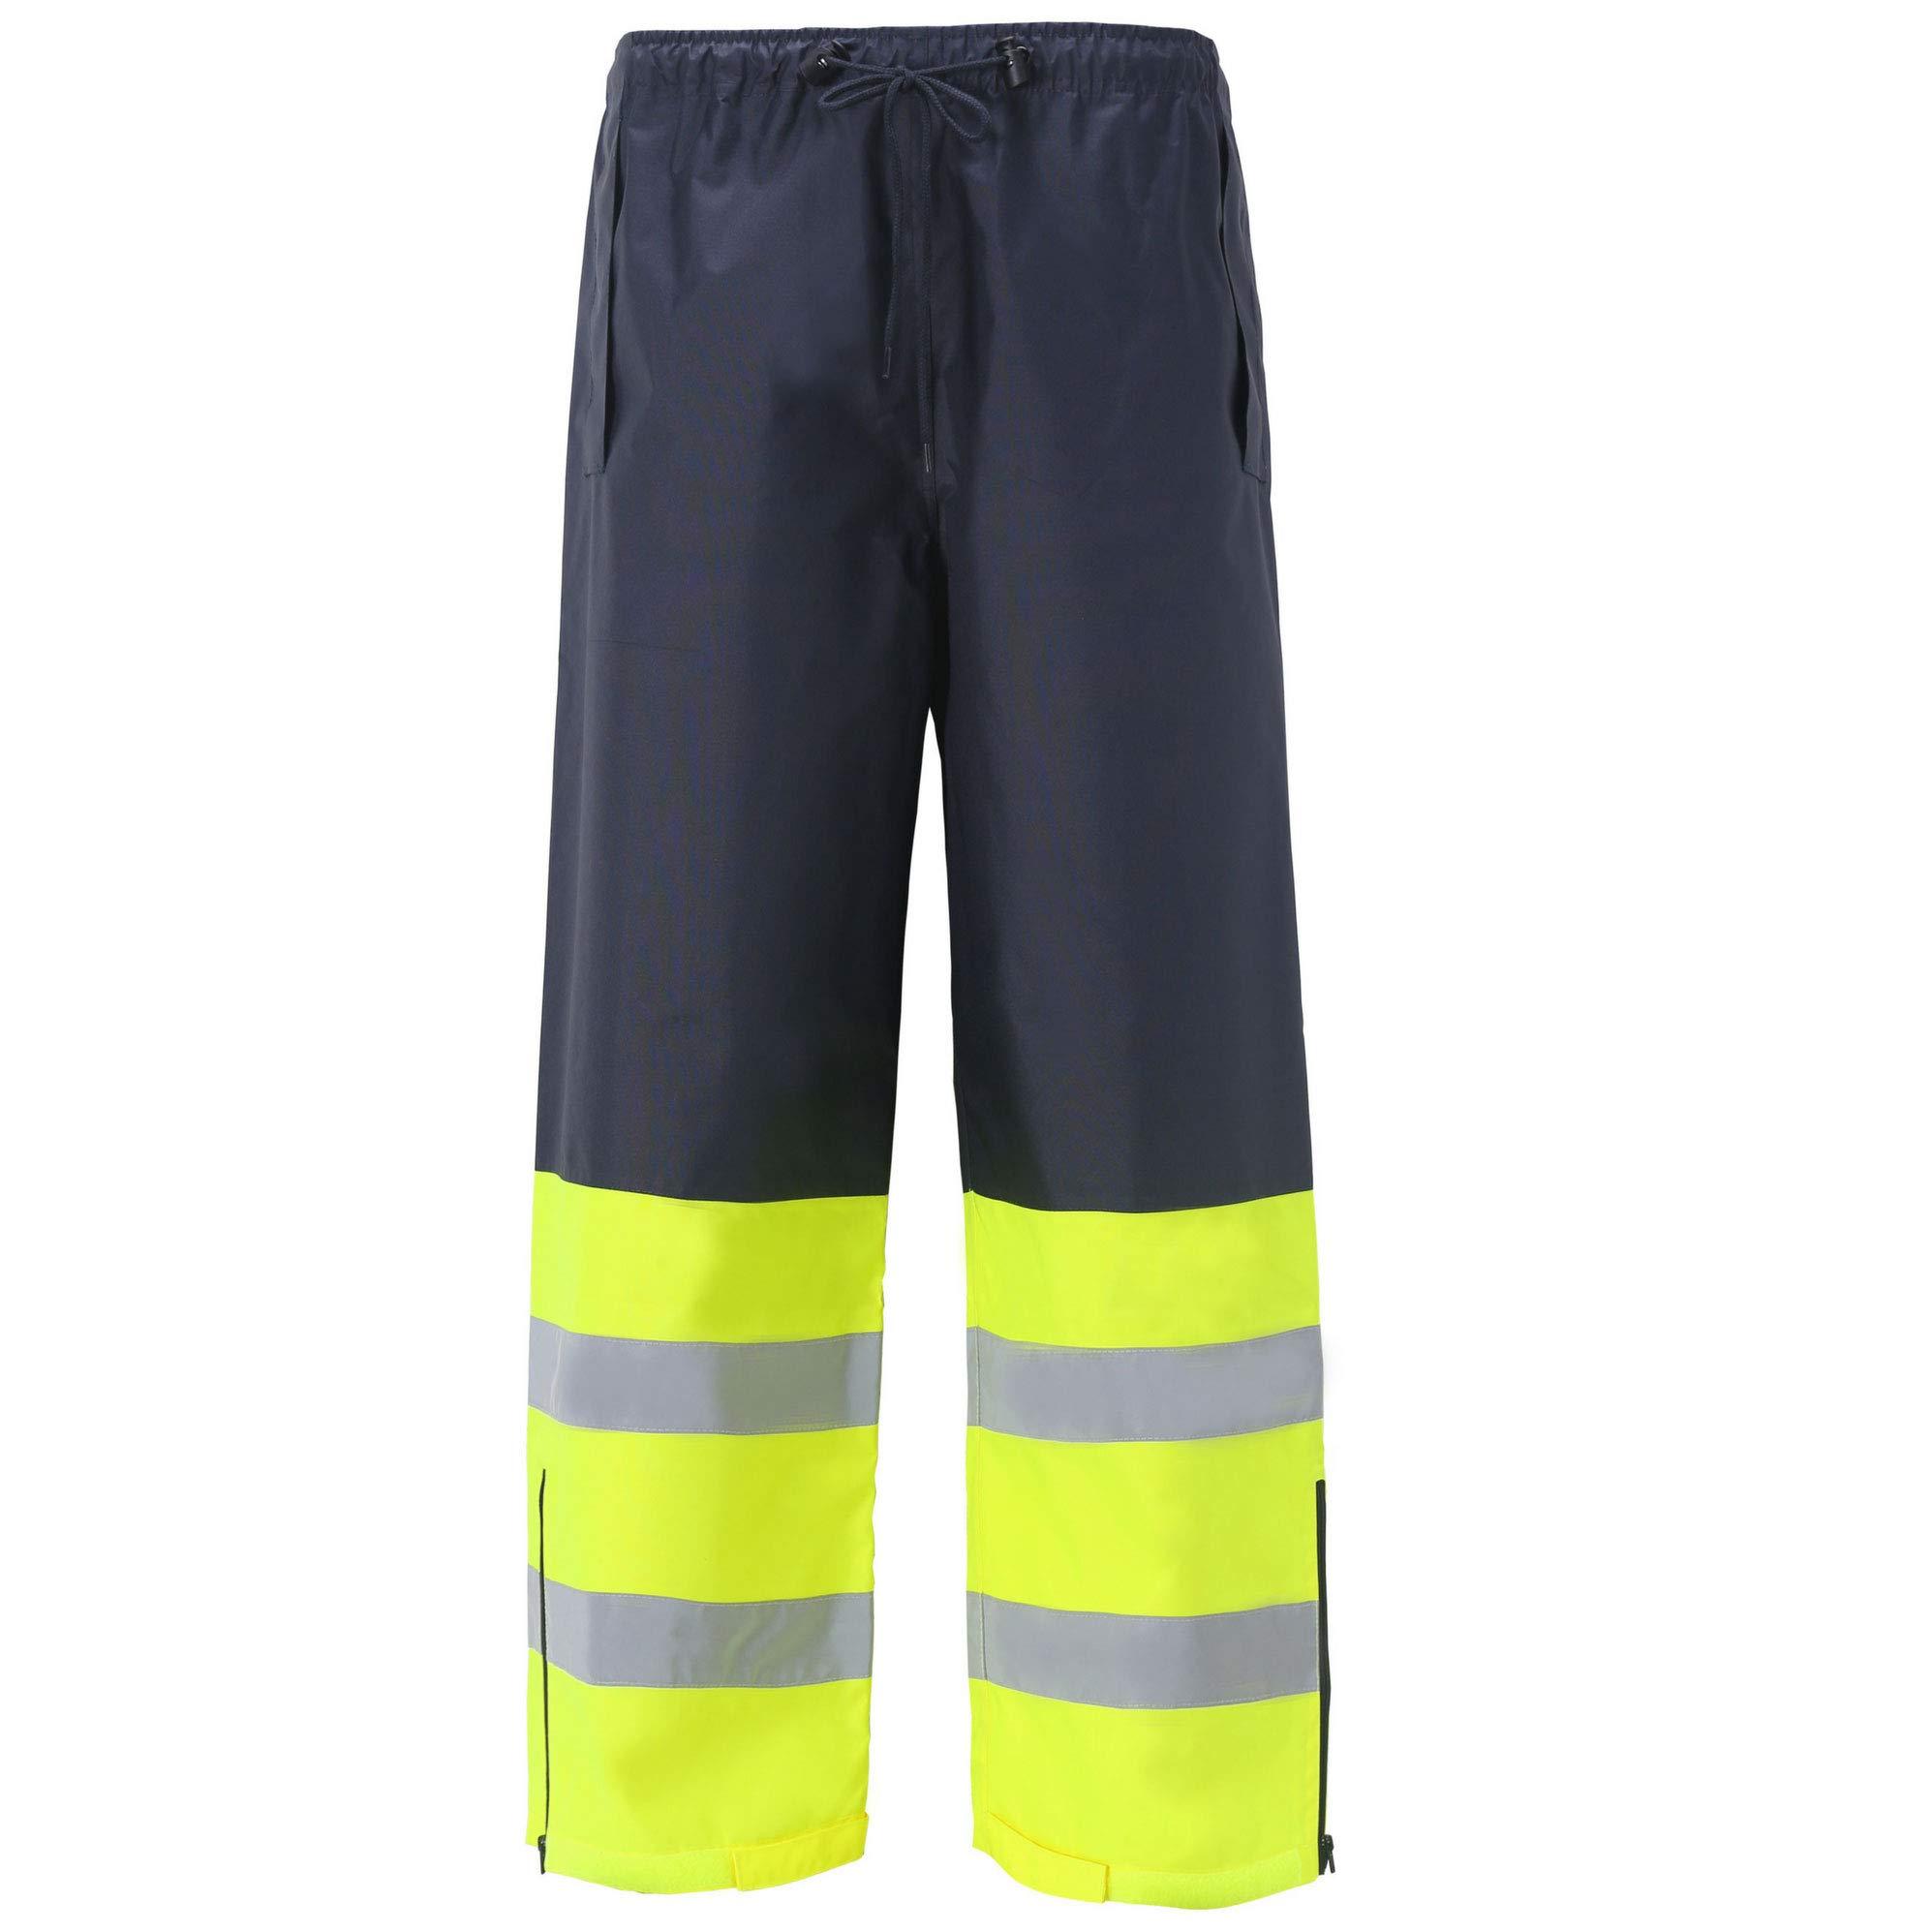 High Viz Rain Pants for Men and Women Waterproof Work Wear Water Resistant Ansi Class E Two Tone (Medium, Navy Blue, 1 Piece)